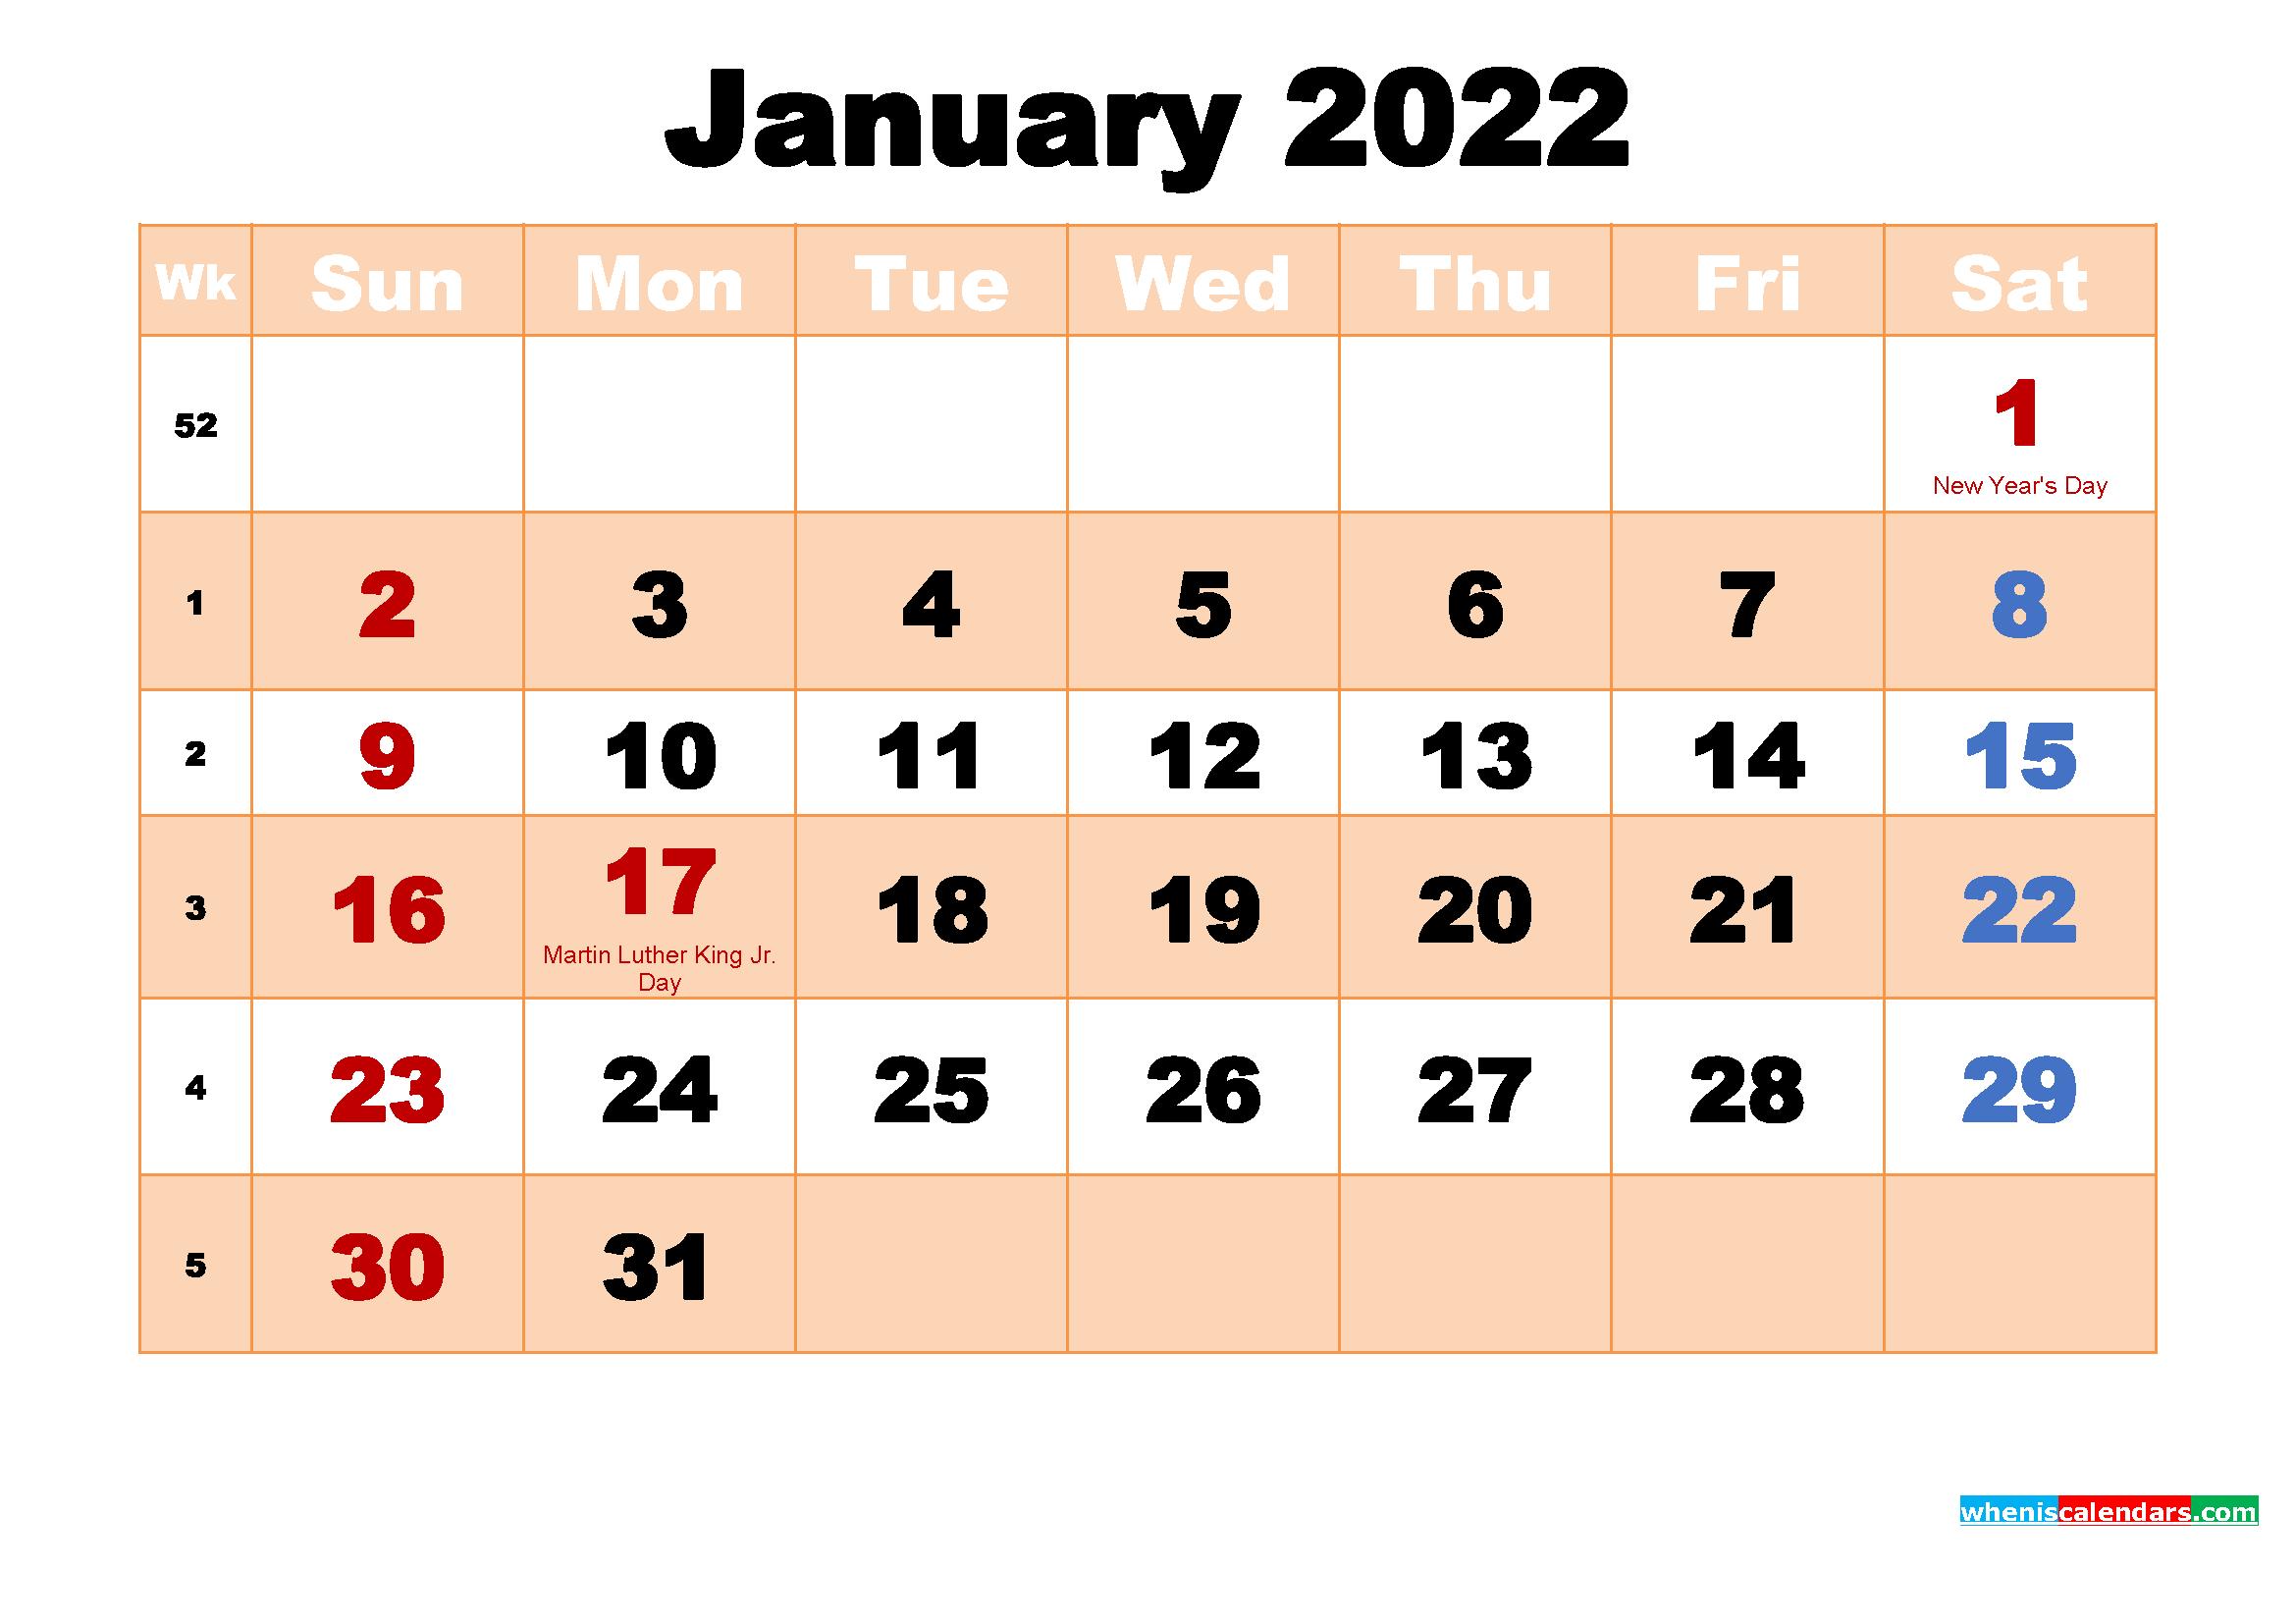 Free Printable January 2022 Calendar With Holidays Within Blank Calendar January 2022 Printable